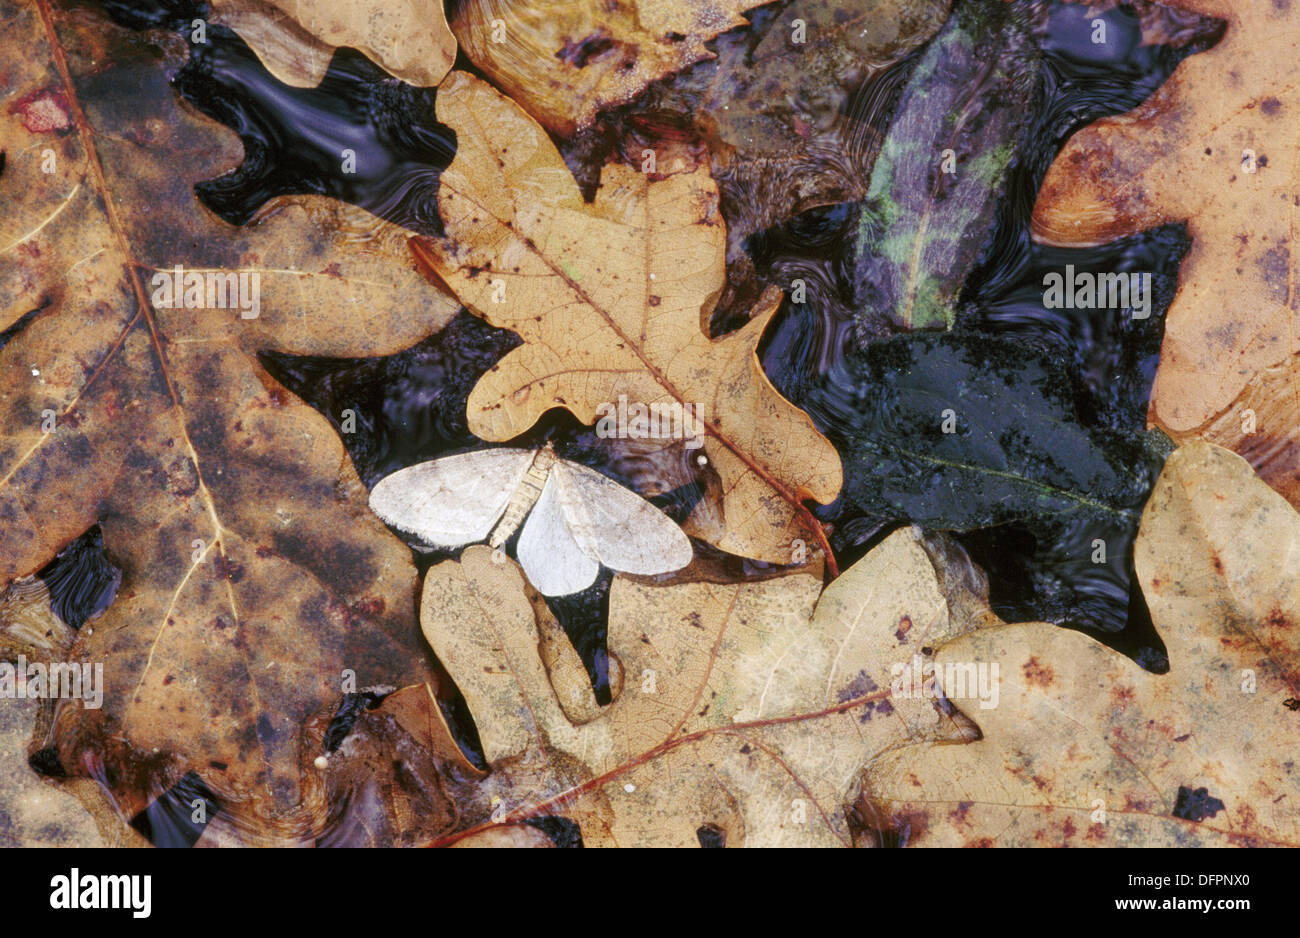 Winter Moth (Operophtera brumata) and oak leaves - Stock Image